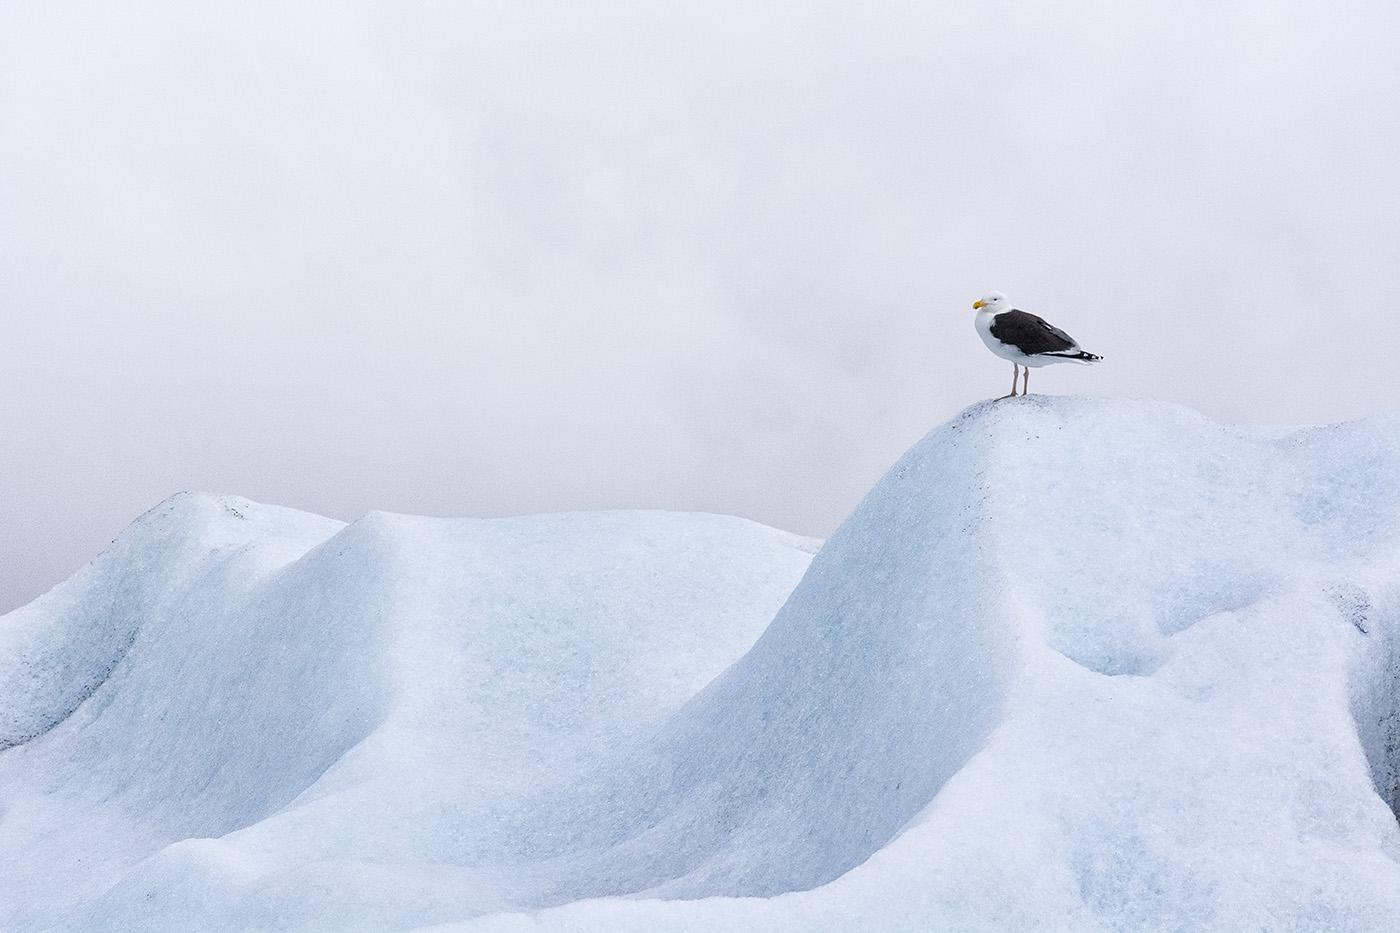 Great Black-backed Gull  (Larus marinus) - Jökulsárlón, Iceland    Nikon D7100 + Nikon 200-500mm VR